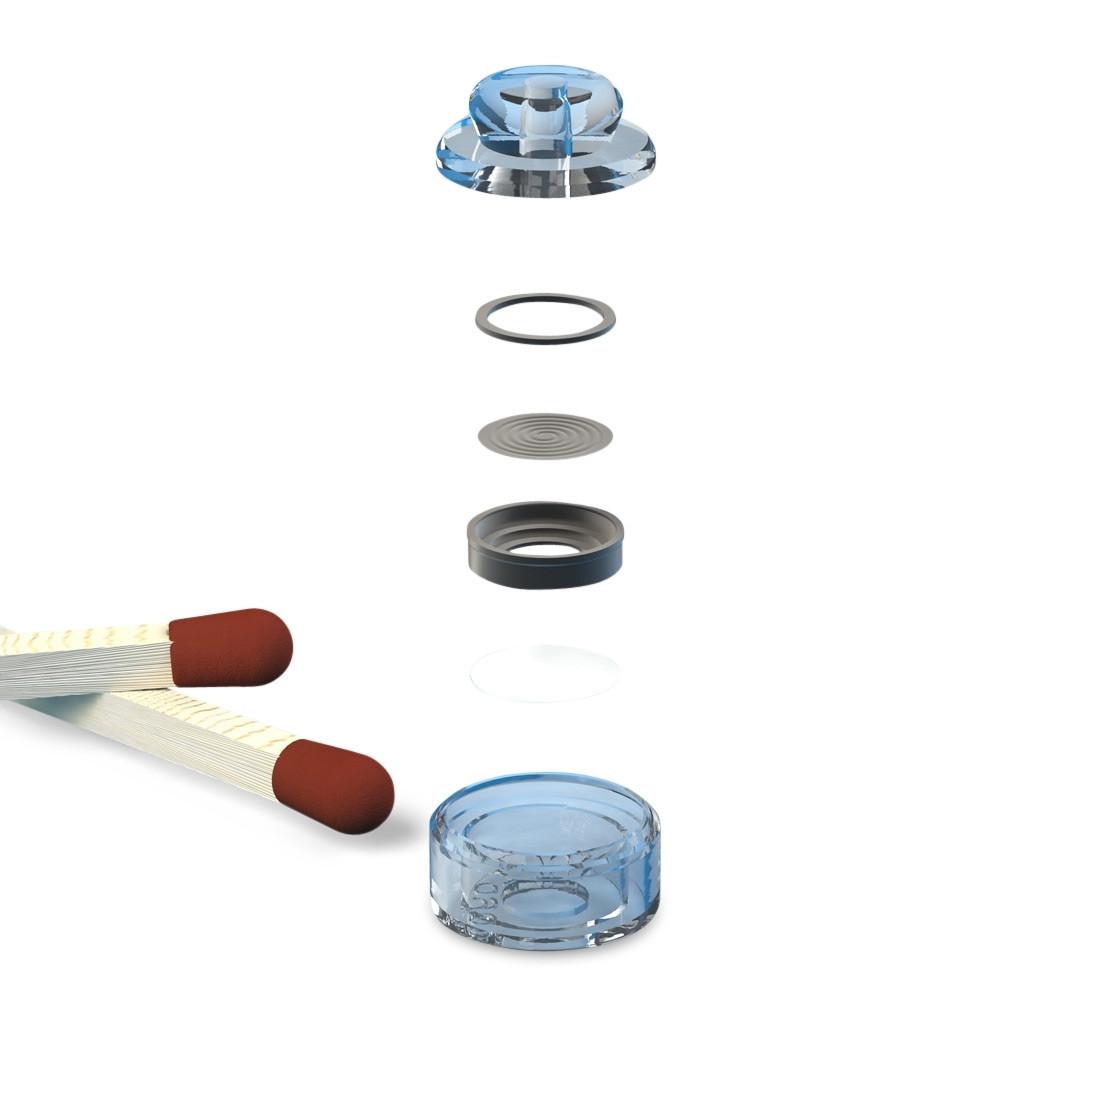 Gehörschutzfilter fidelity b15 - Aufbau